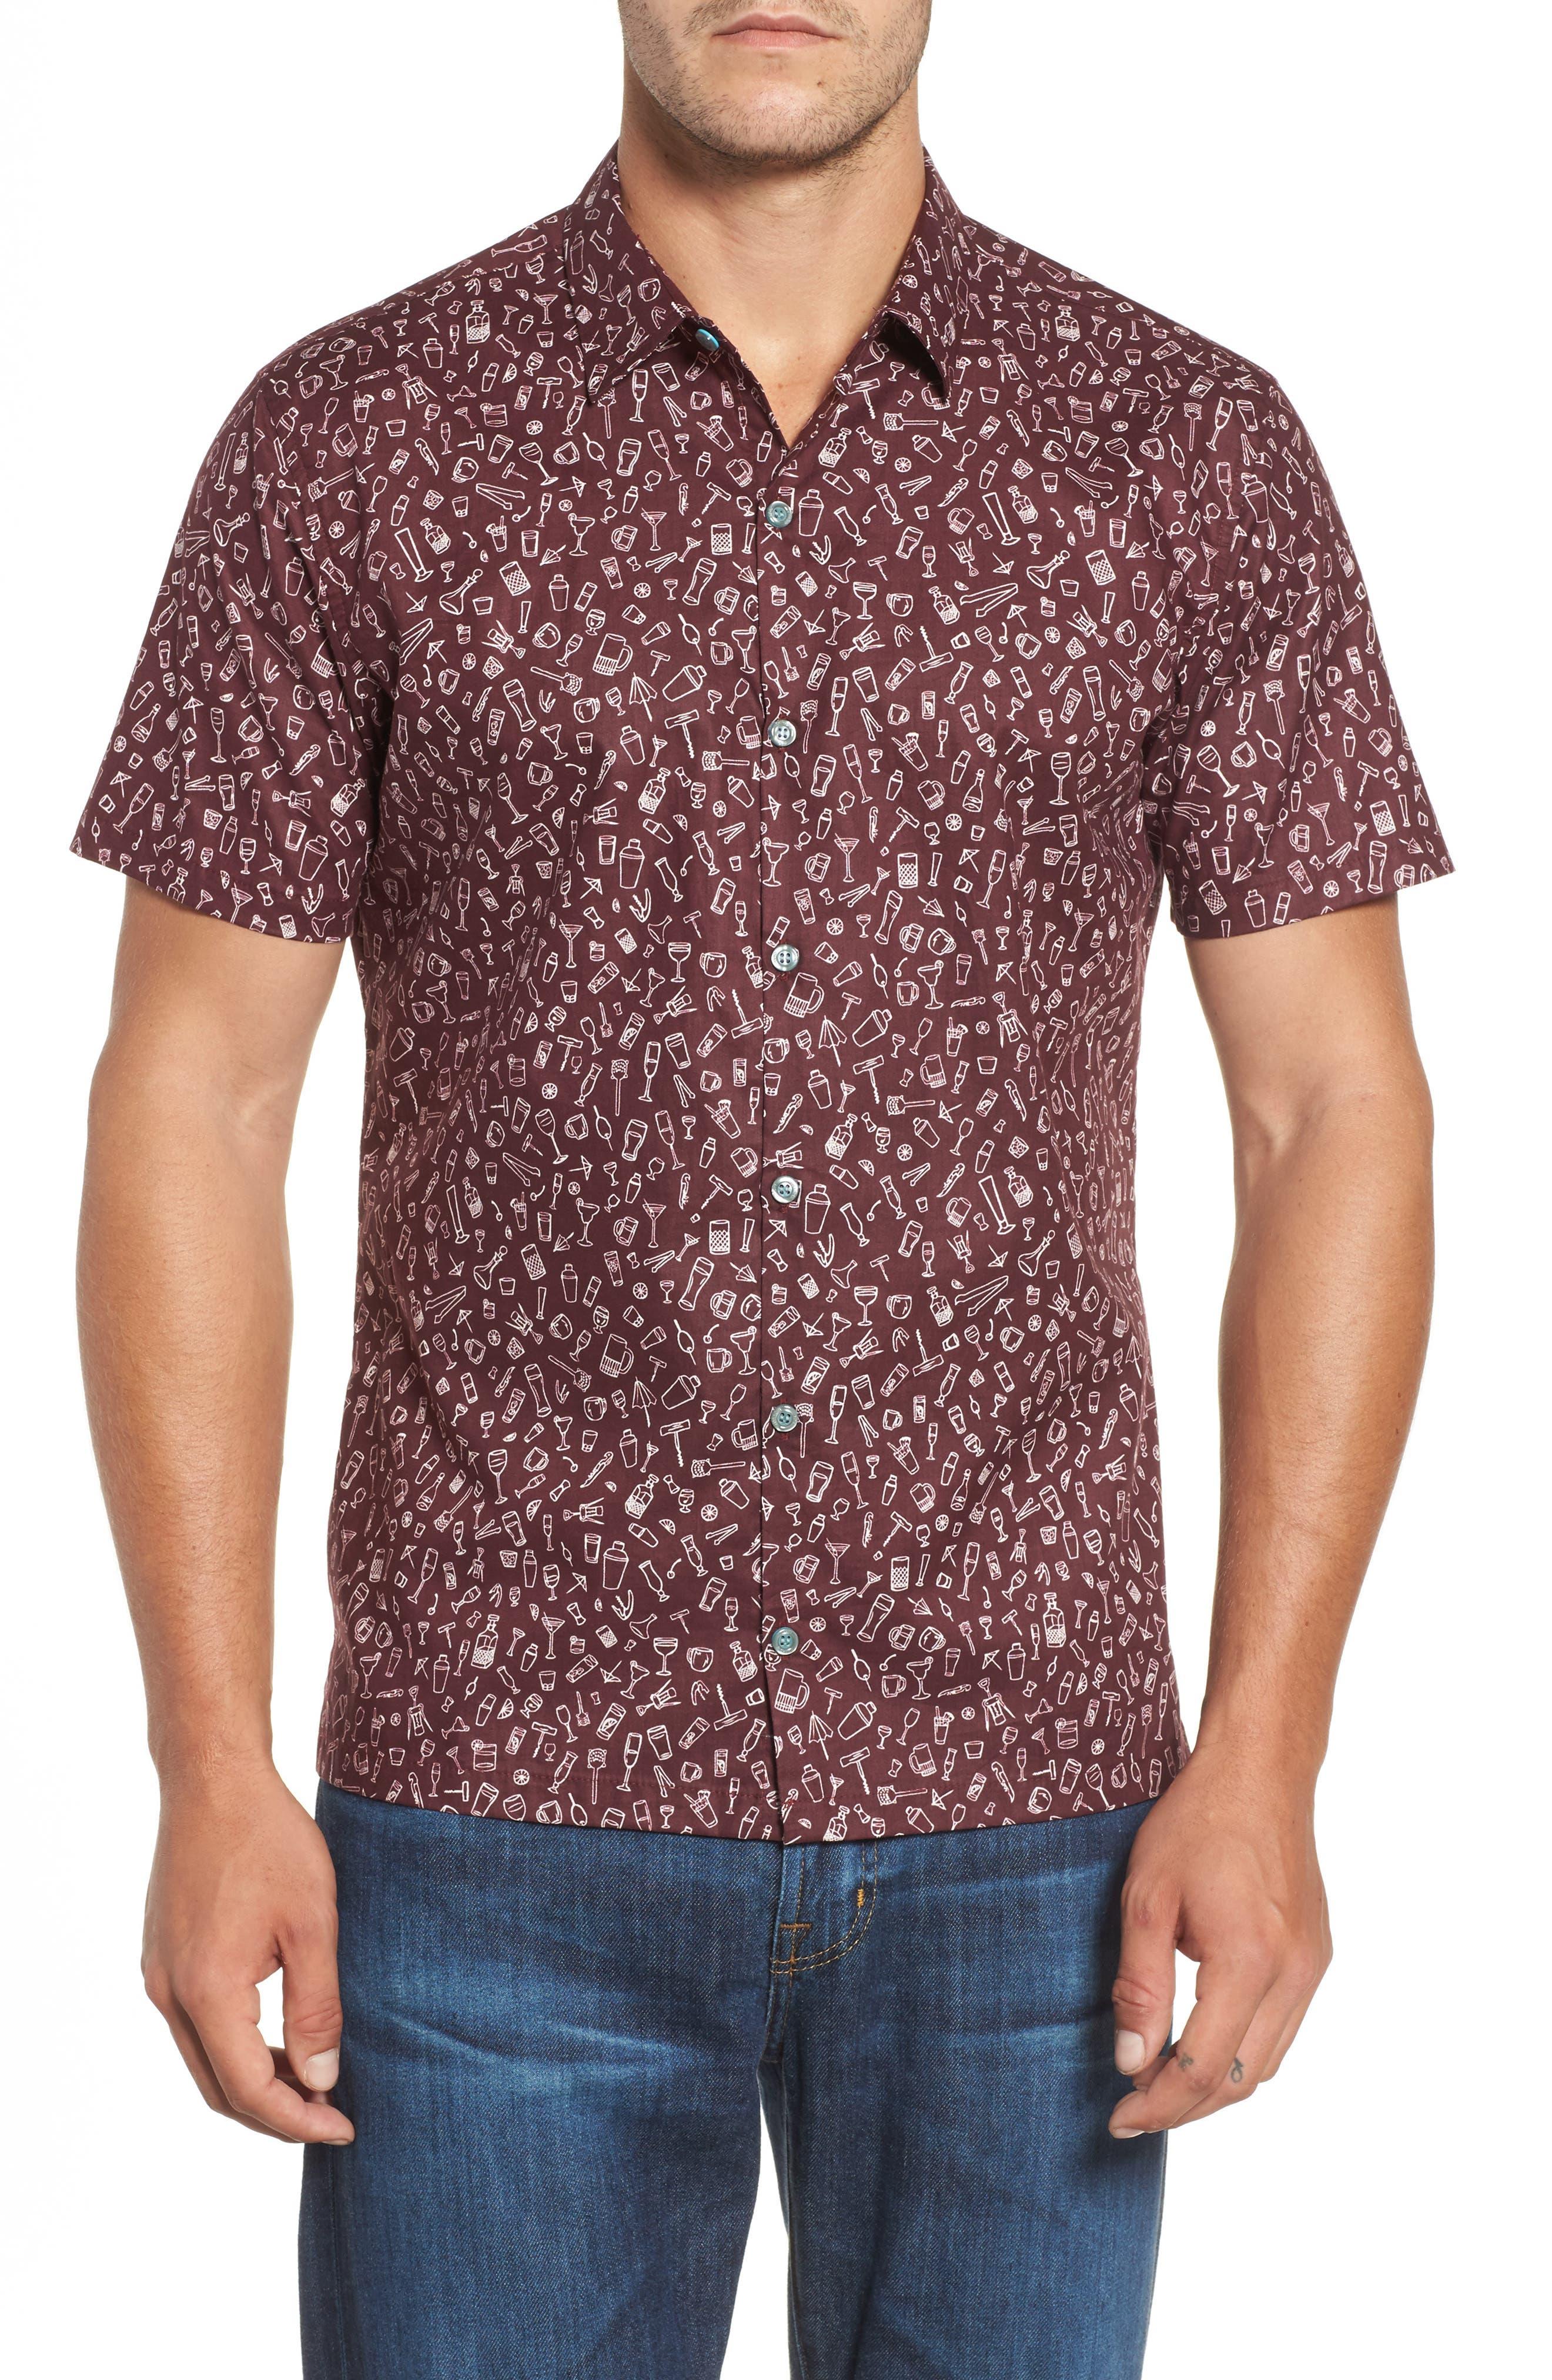 Tori Richard 5 PM Slim Fit Camp Shirt